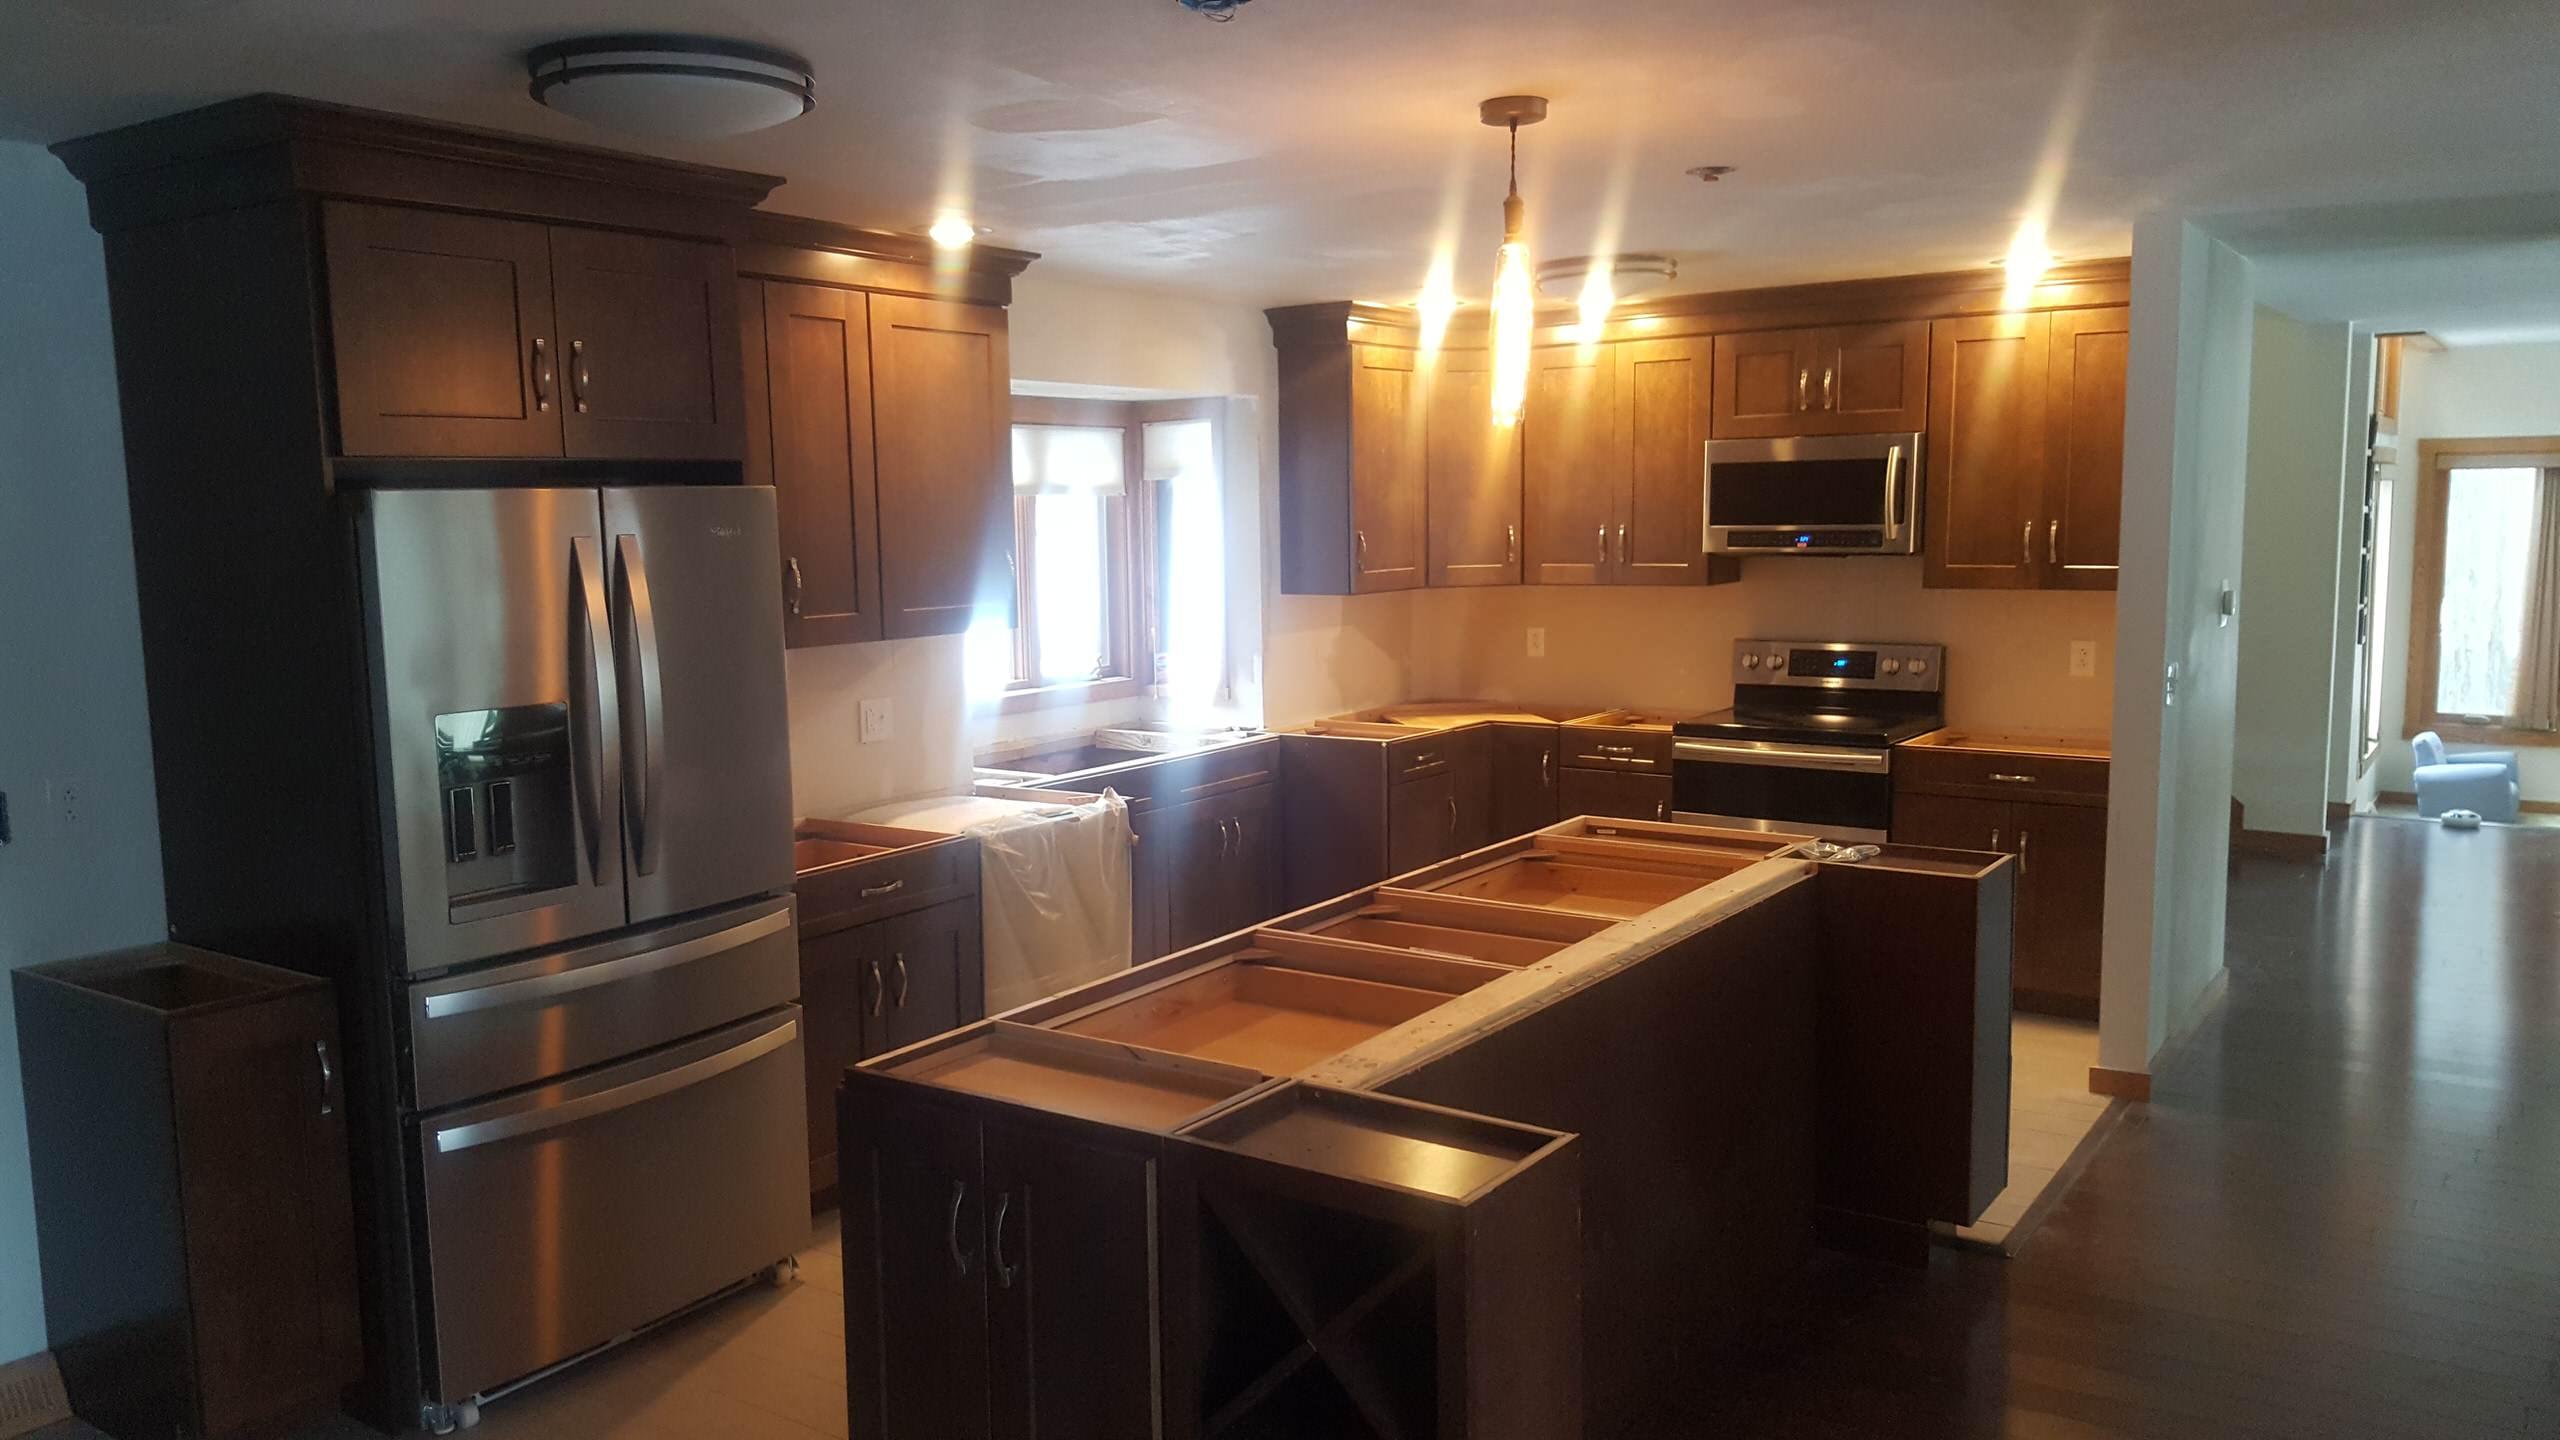 Home Remodel - Kitchen, Bath, & Exterior